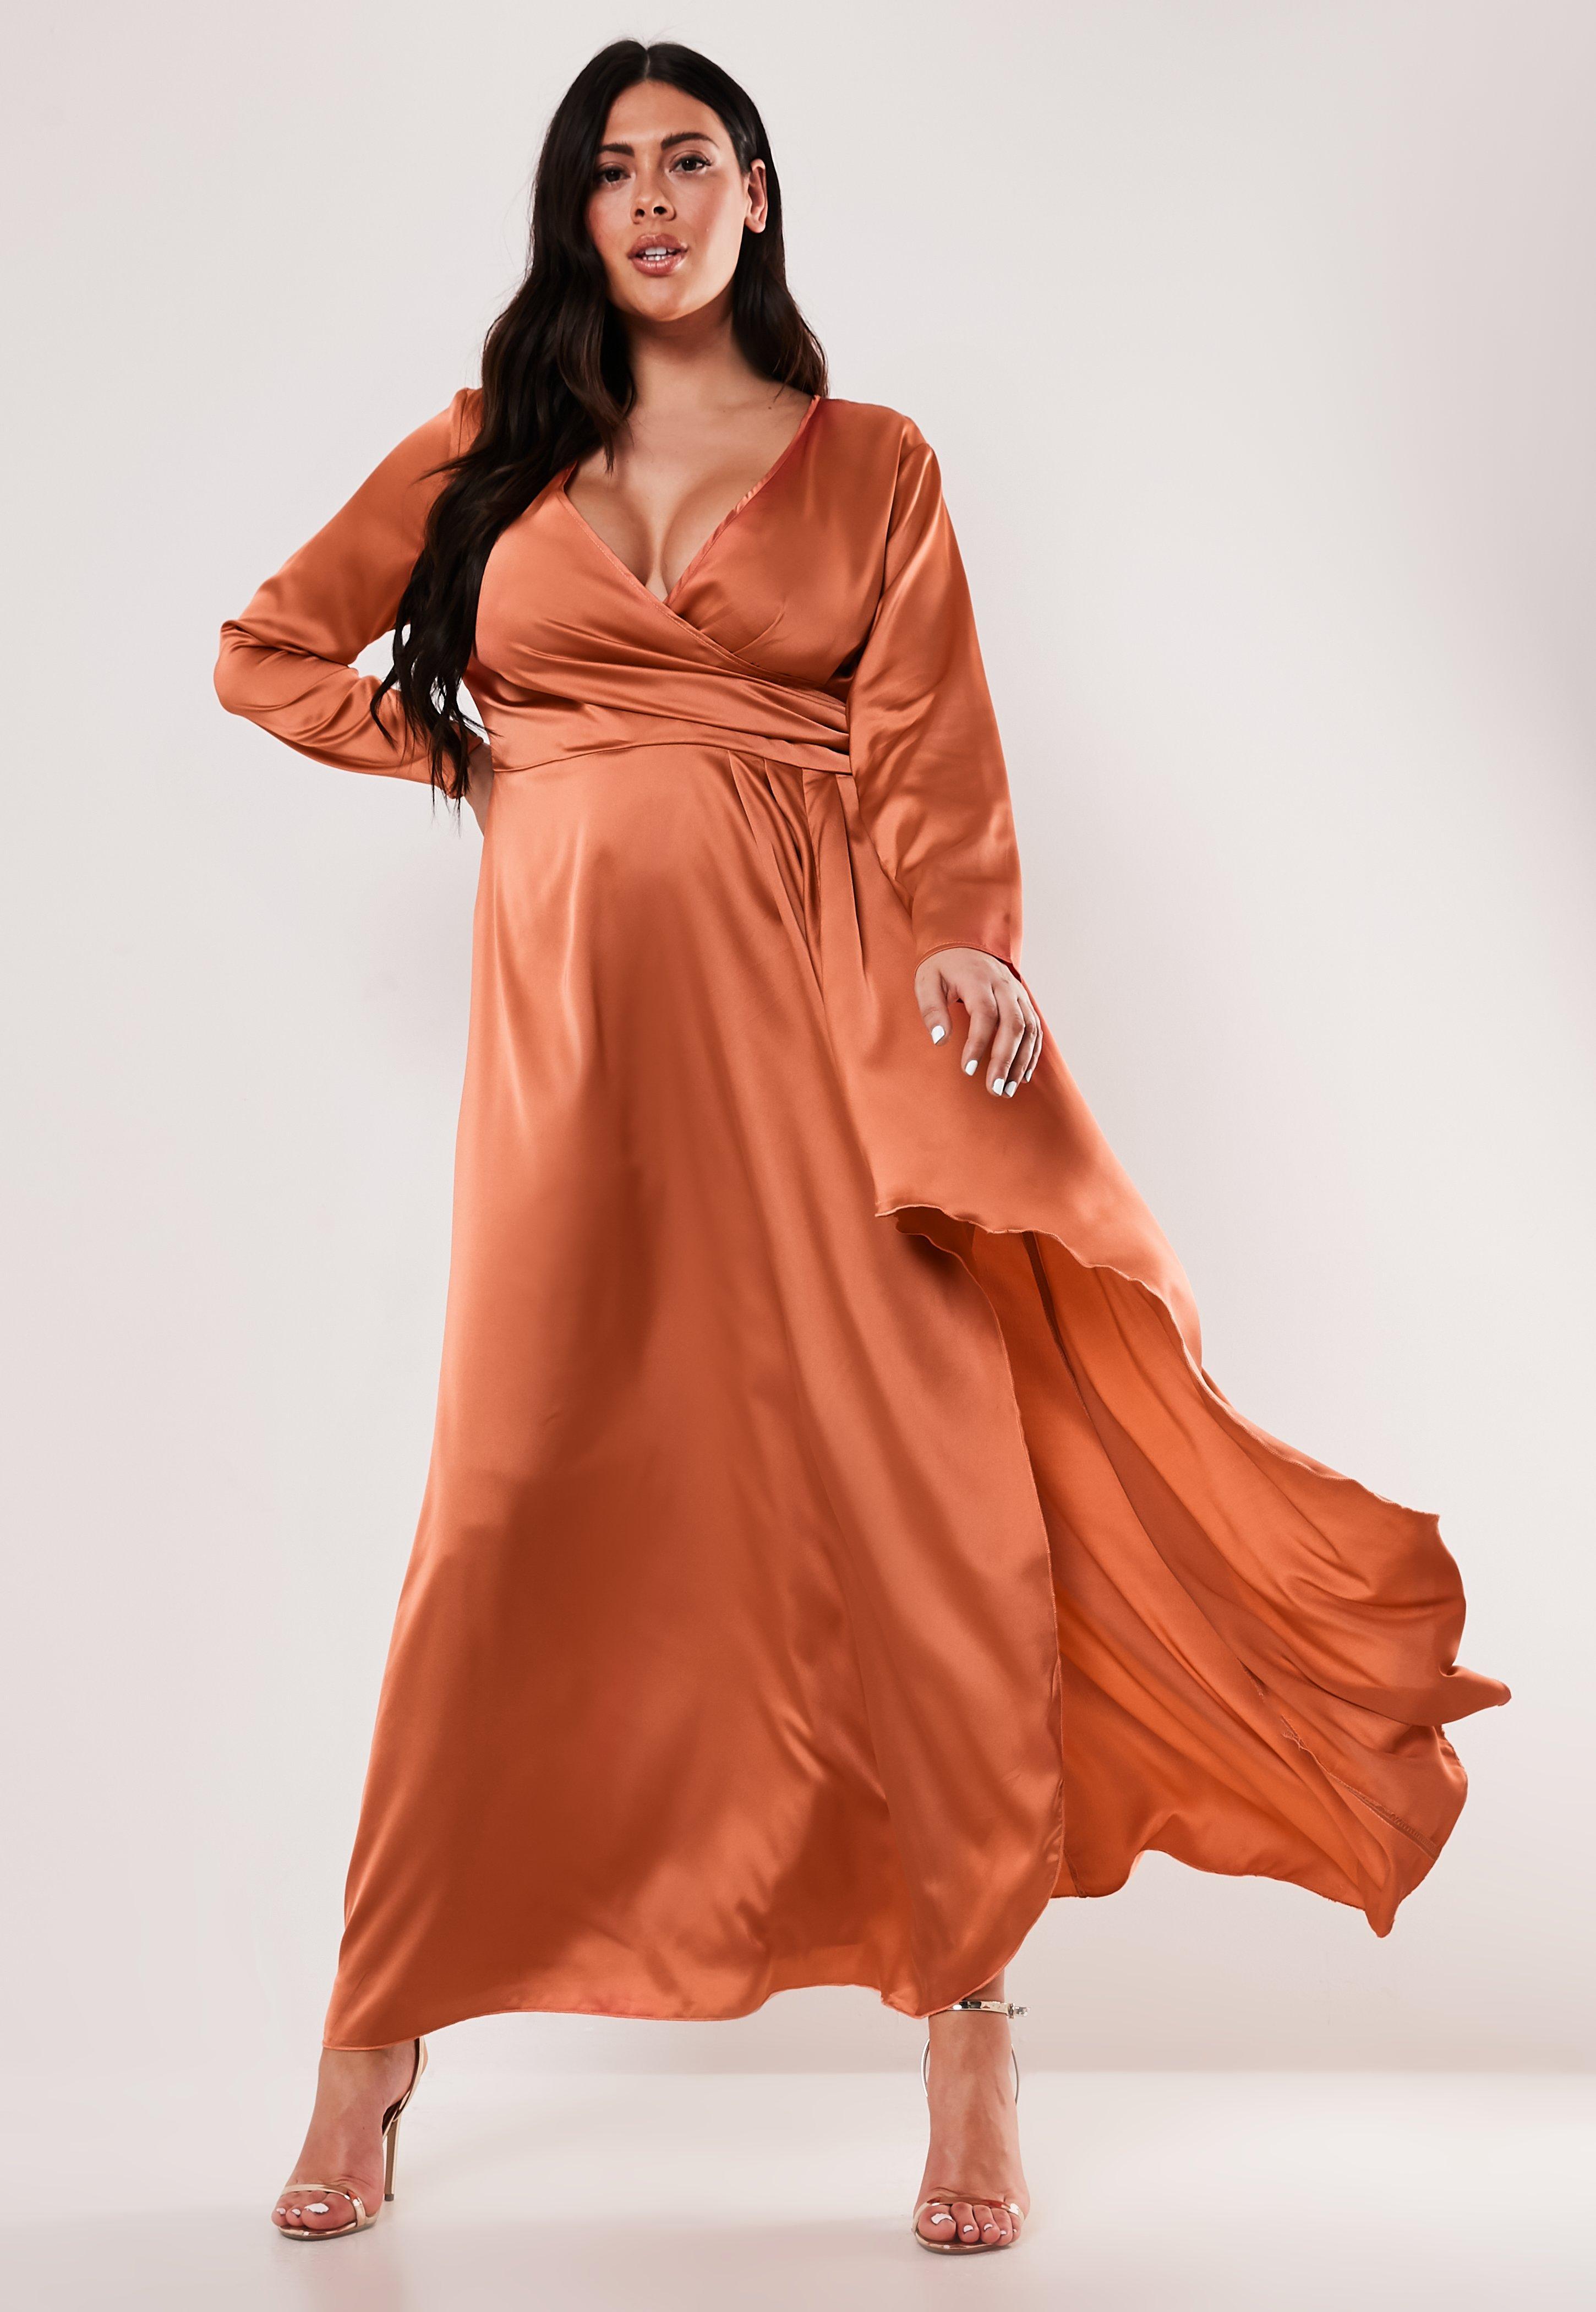 design intemporel 8563b 3a7eb Robe longue en satin rouille Grandes tailles